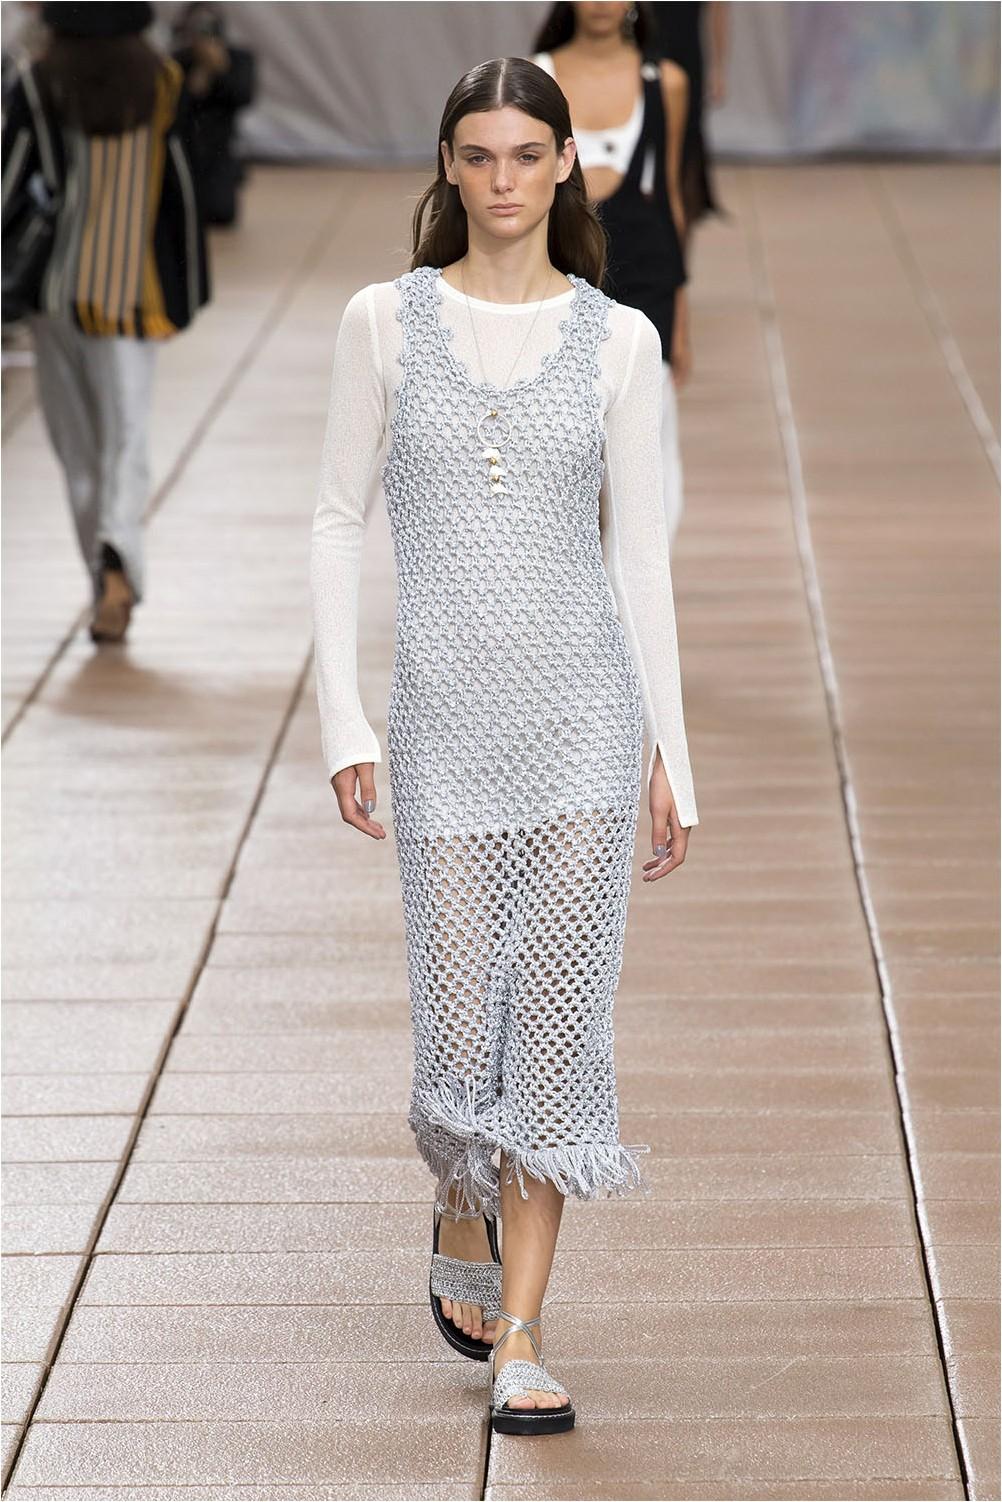 Crochet Dress 3.1 Phillip Lim